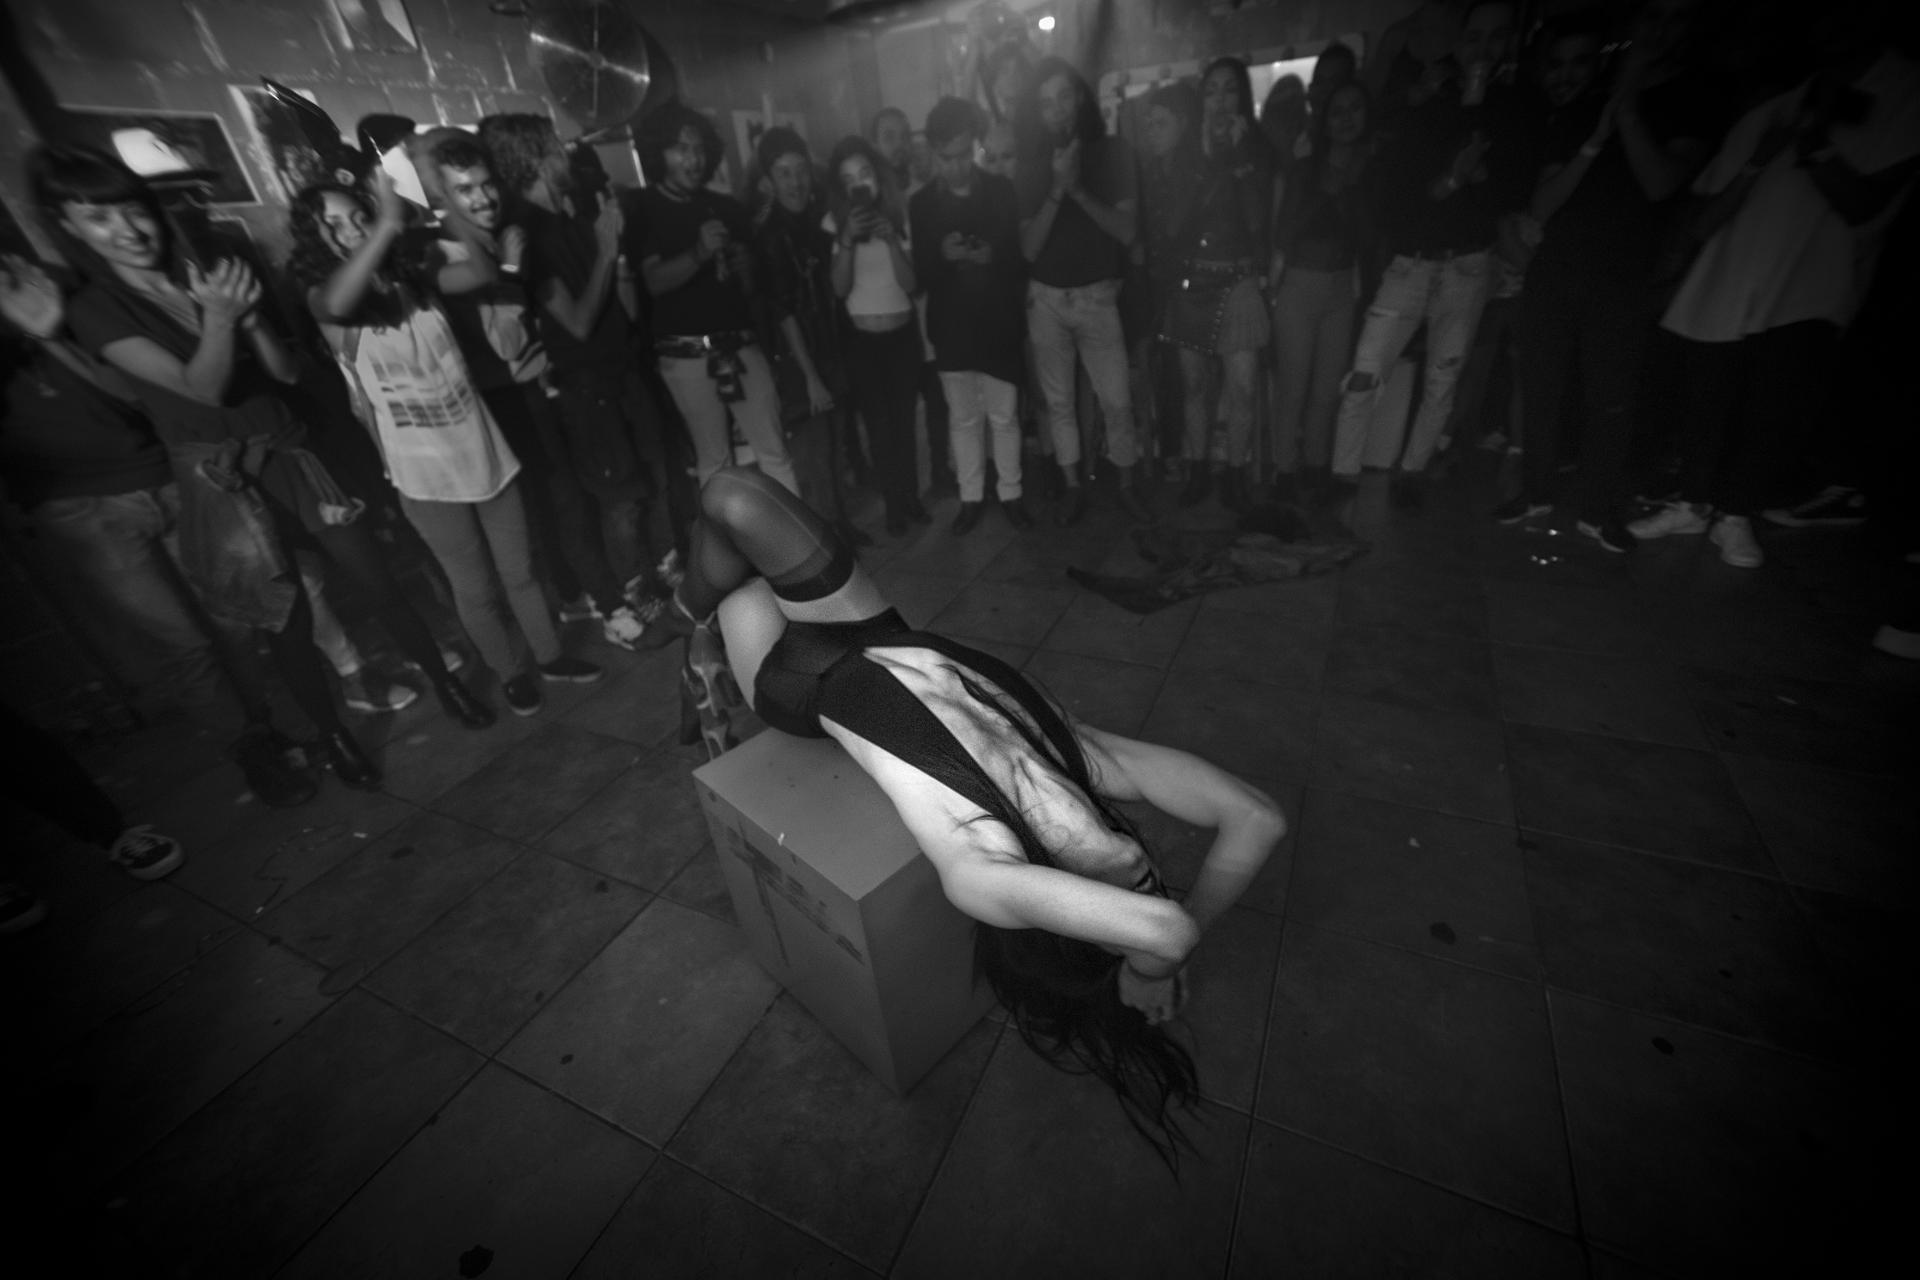 Aesthetic Crisis - Drag Performance